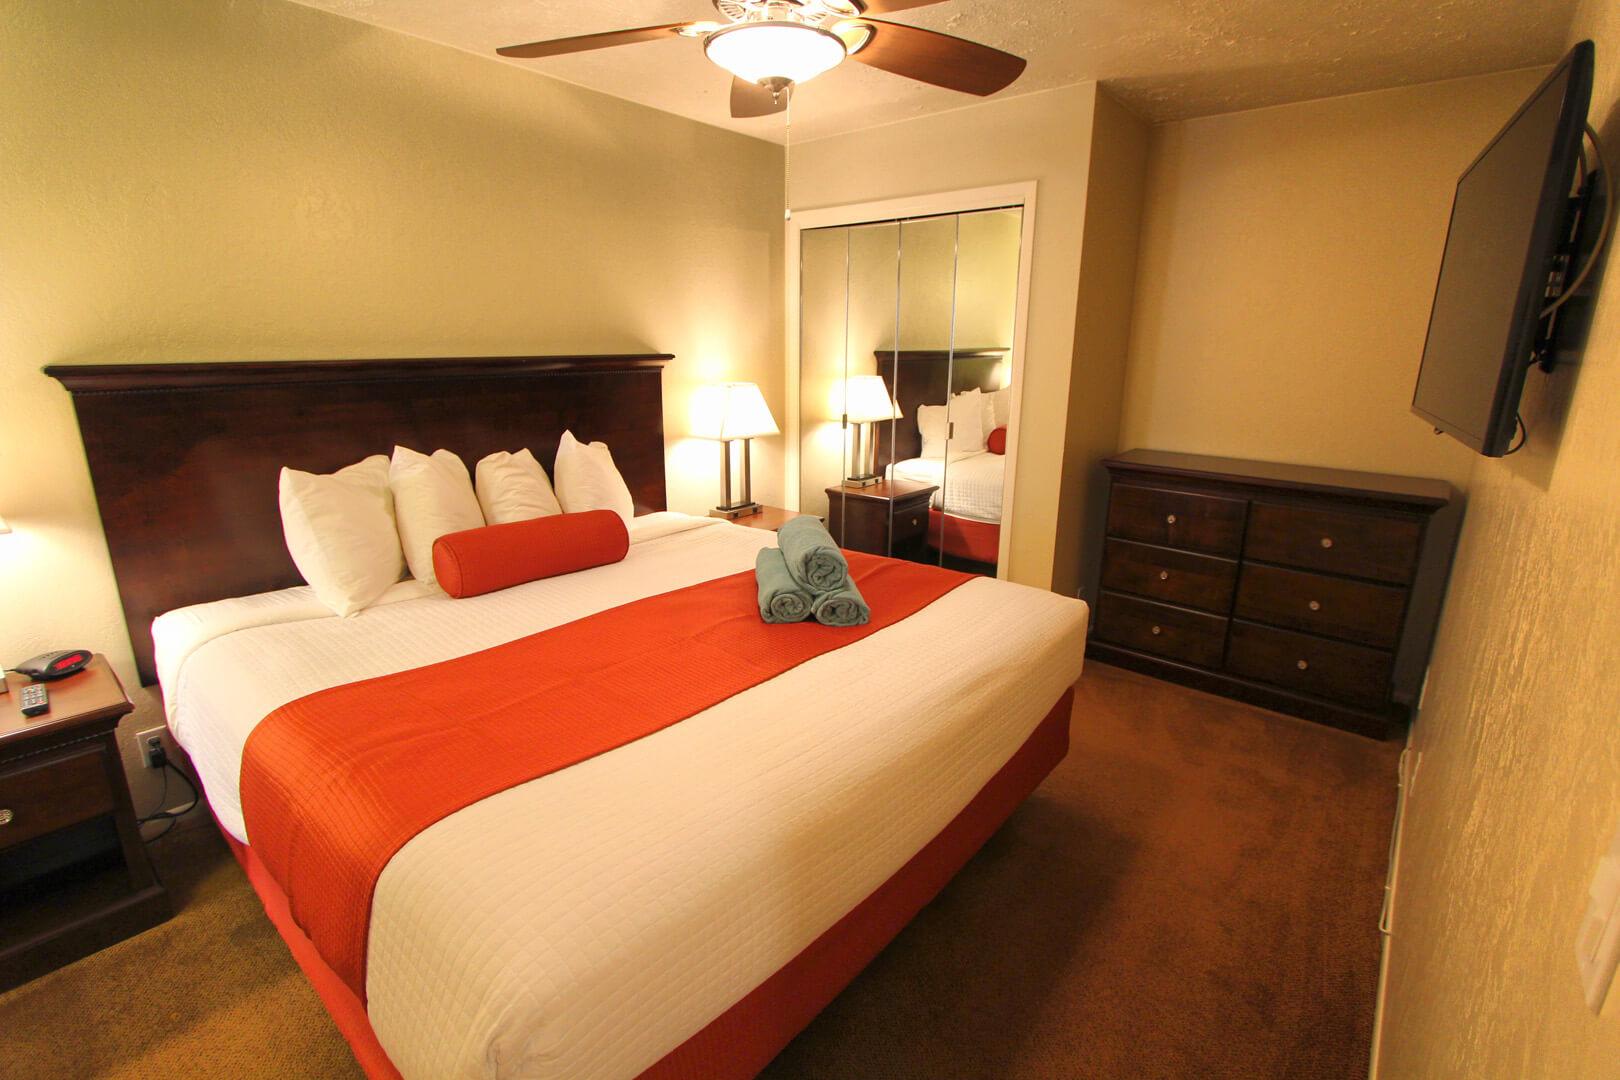 Villas At Southgate Bedroom